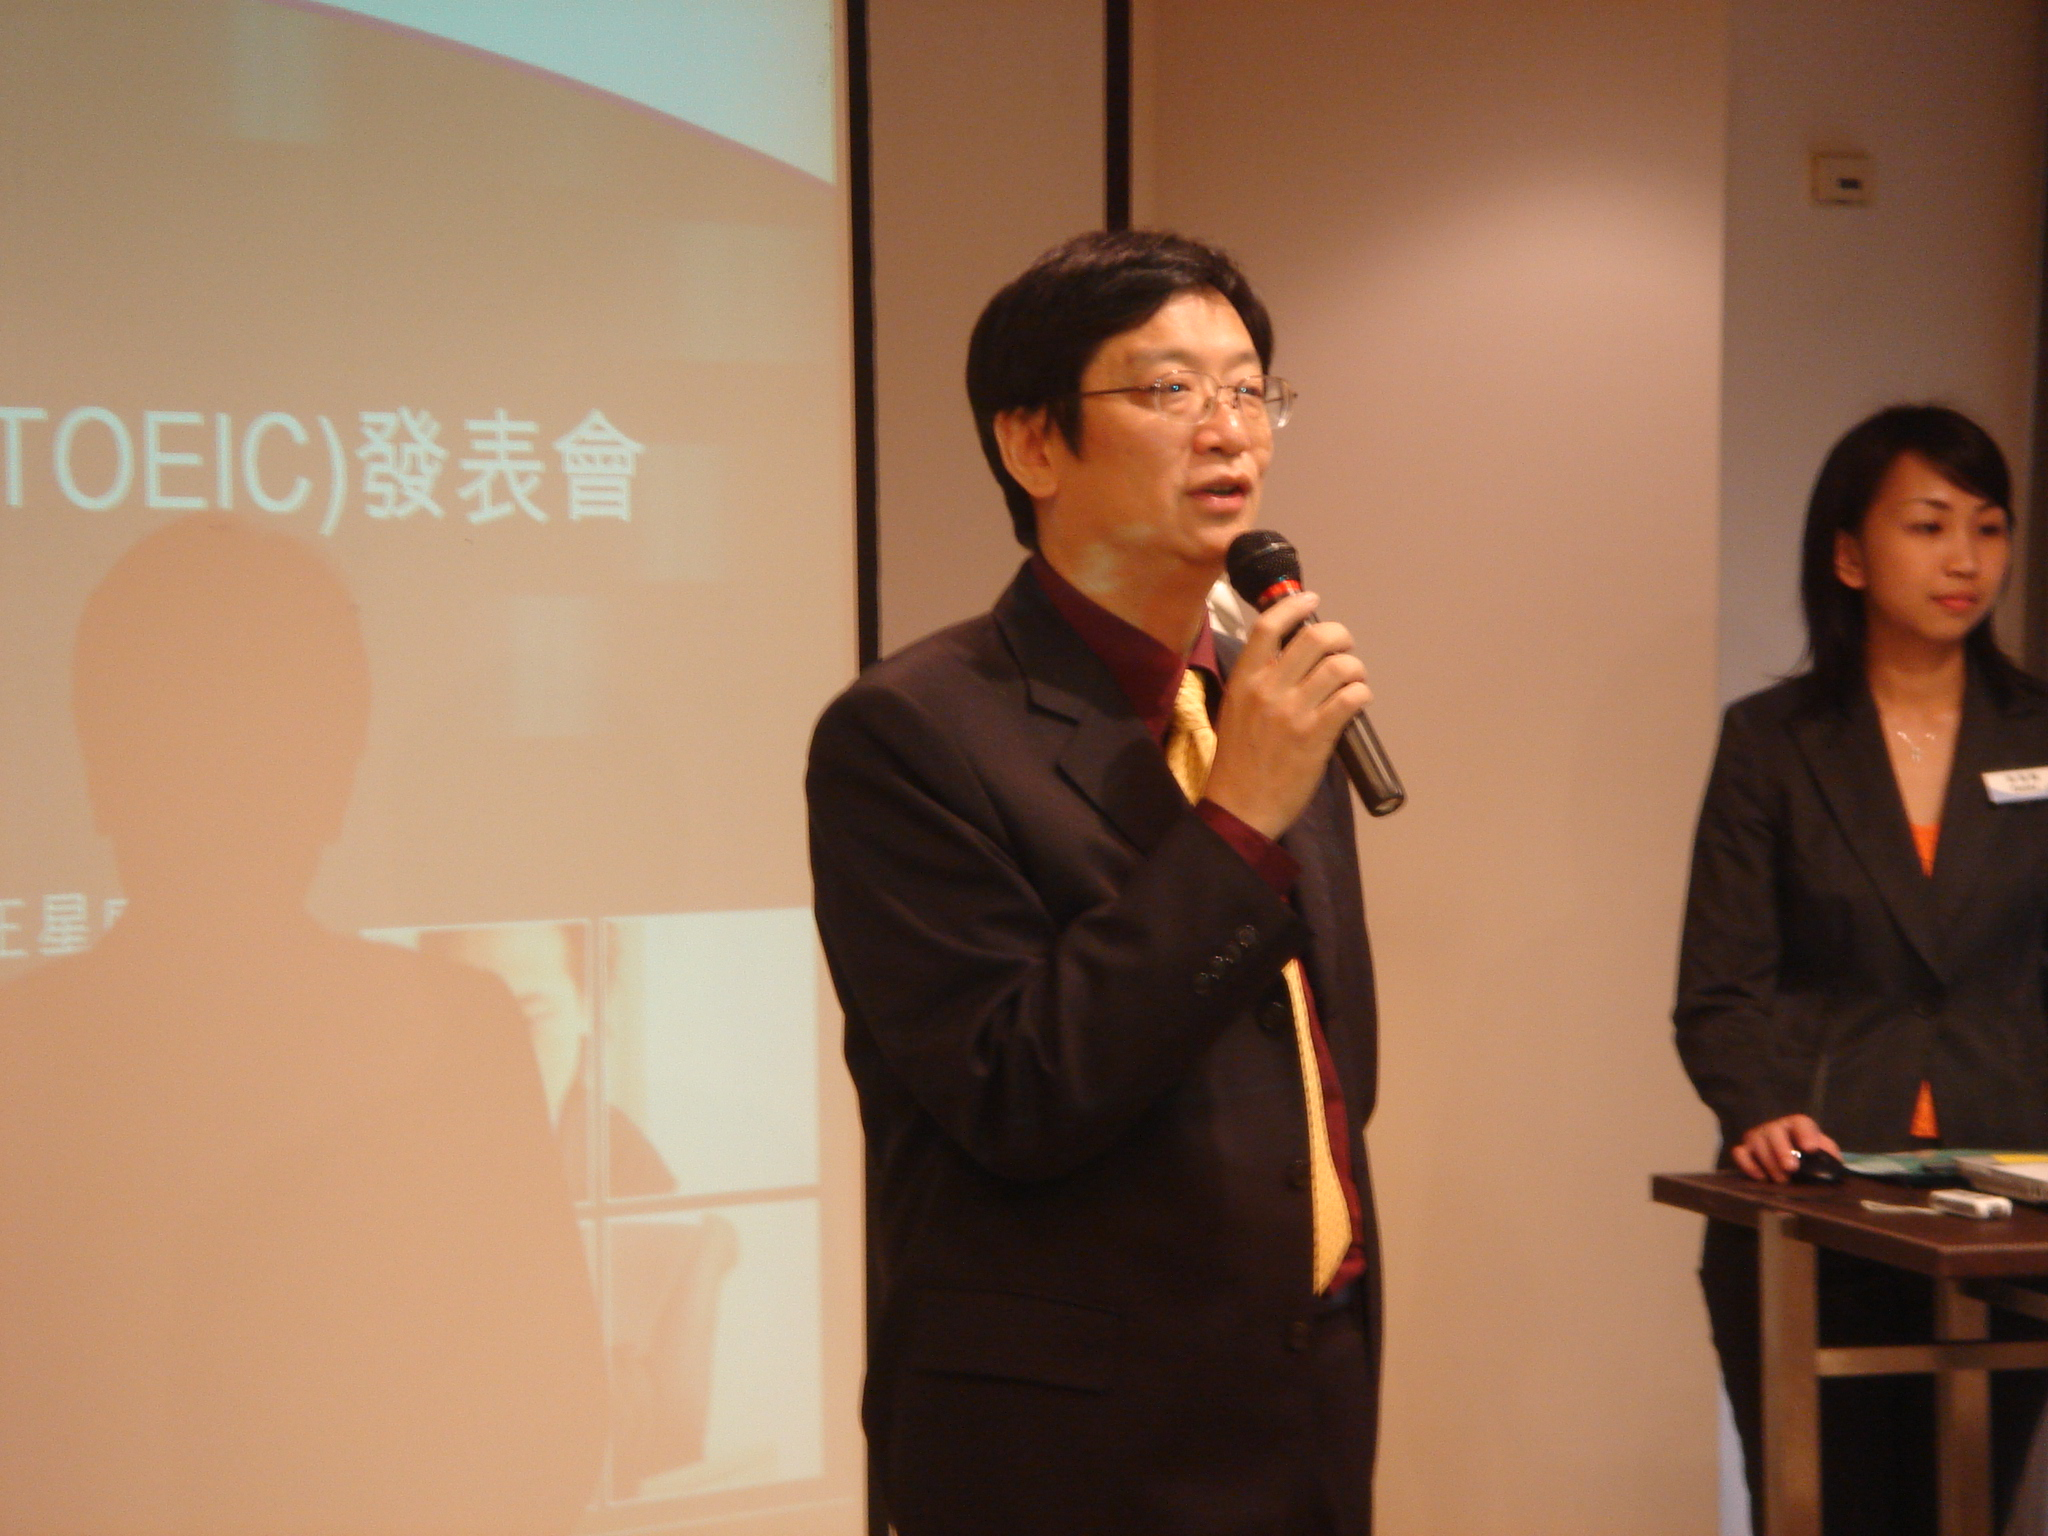 ETS王總經理發表新多益測驗